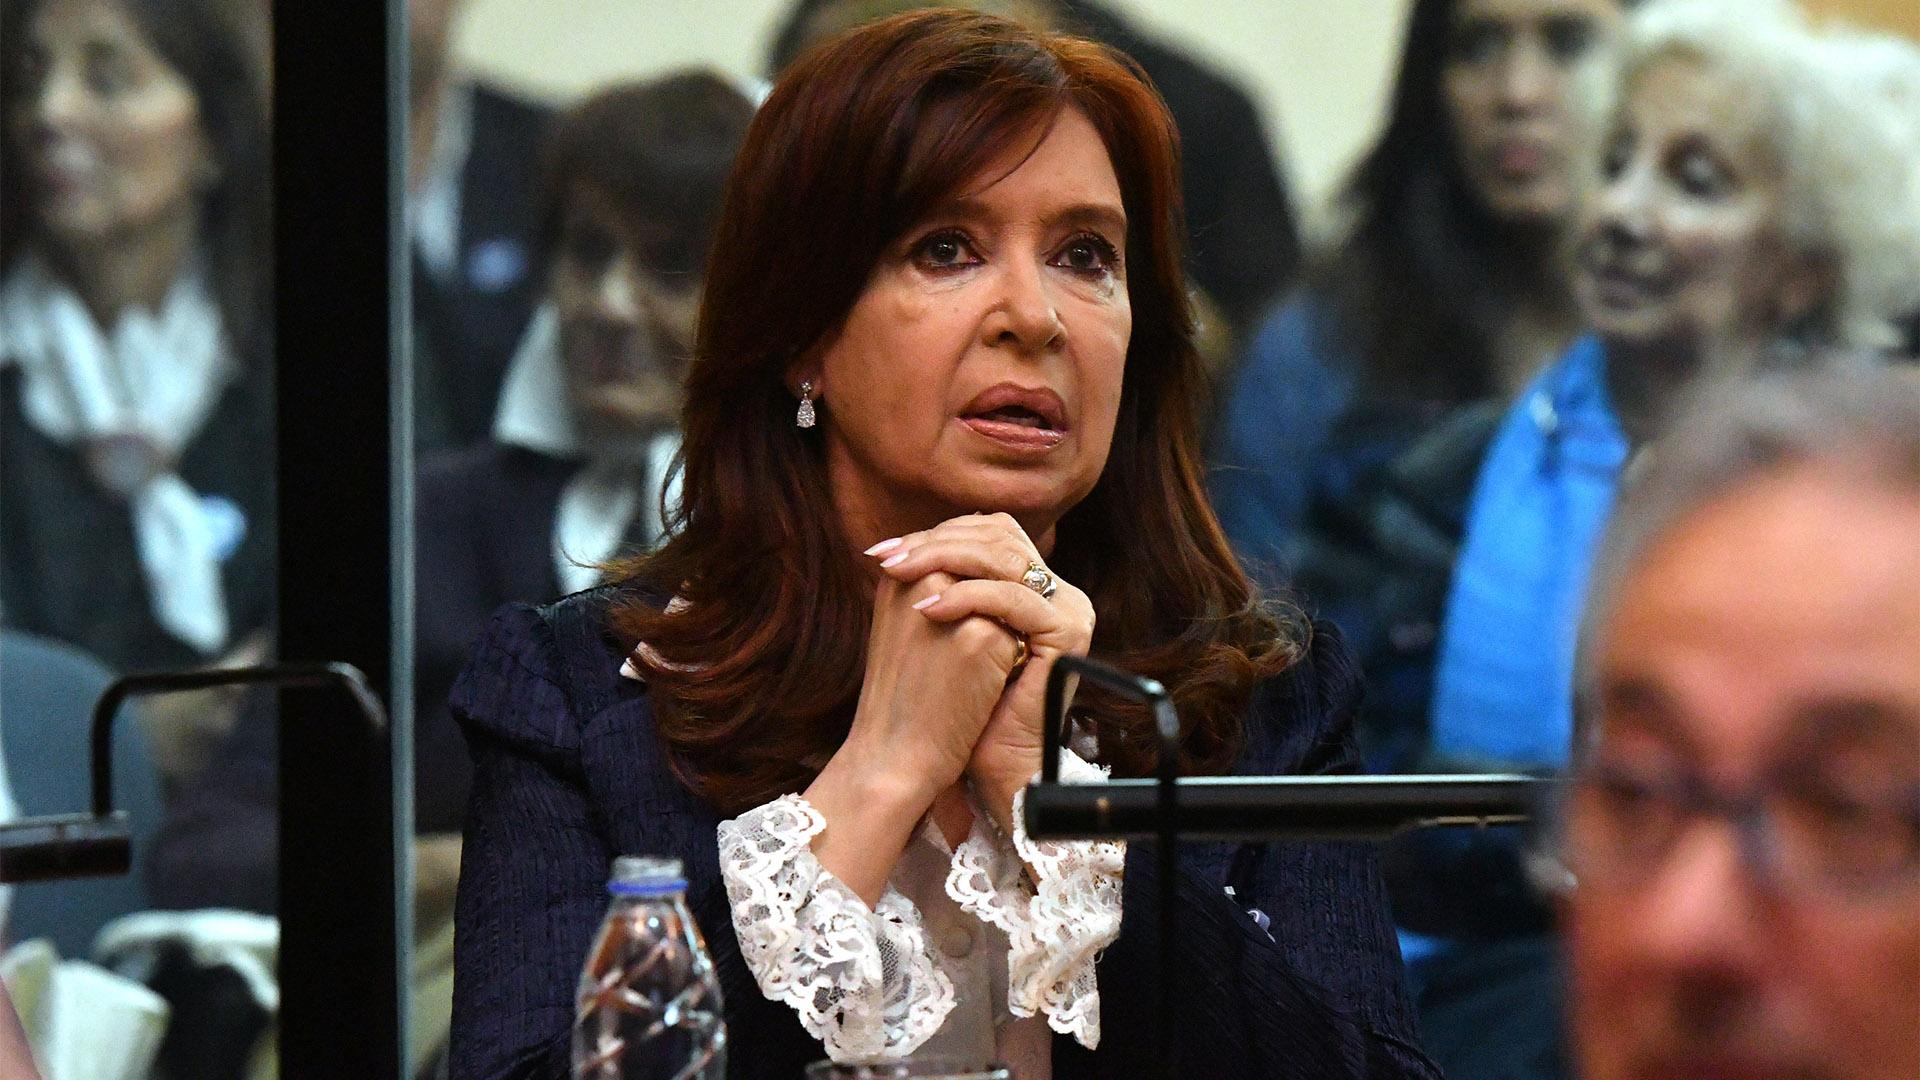 Cristina Kirchner se sentó en la última fila de la sala, junto a su abogado Carlos Beraldi